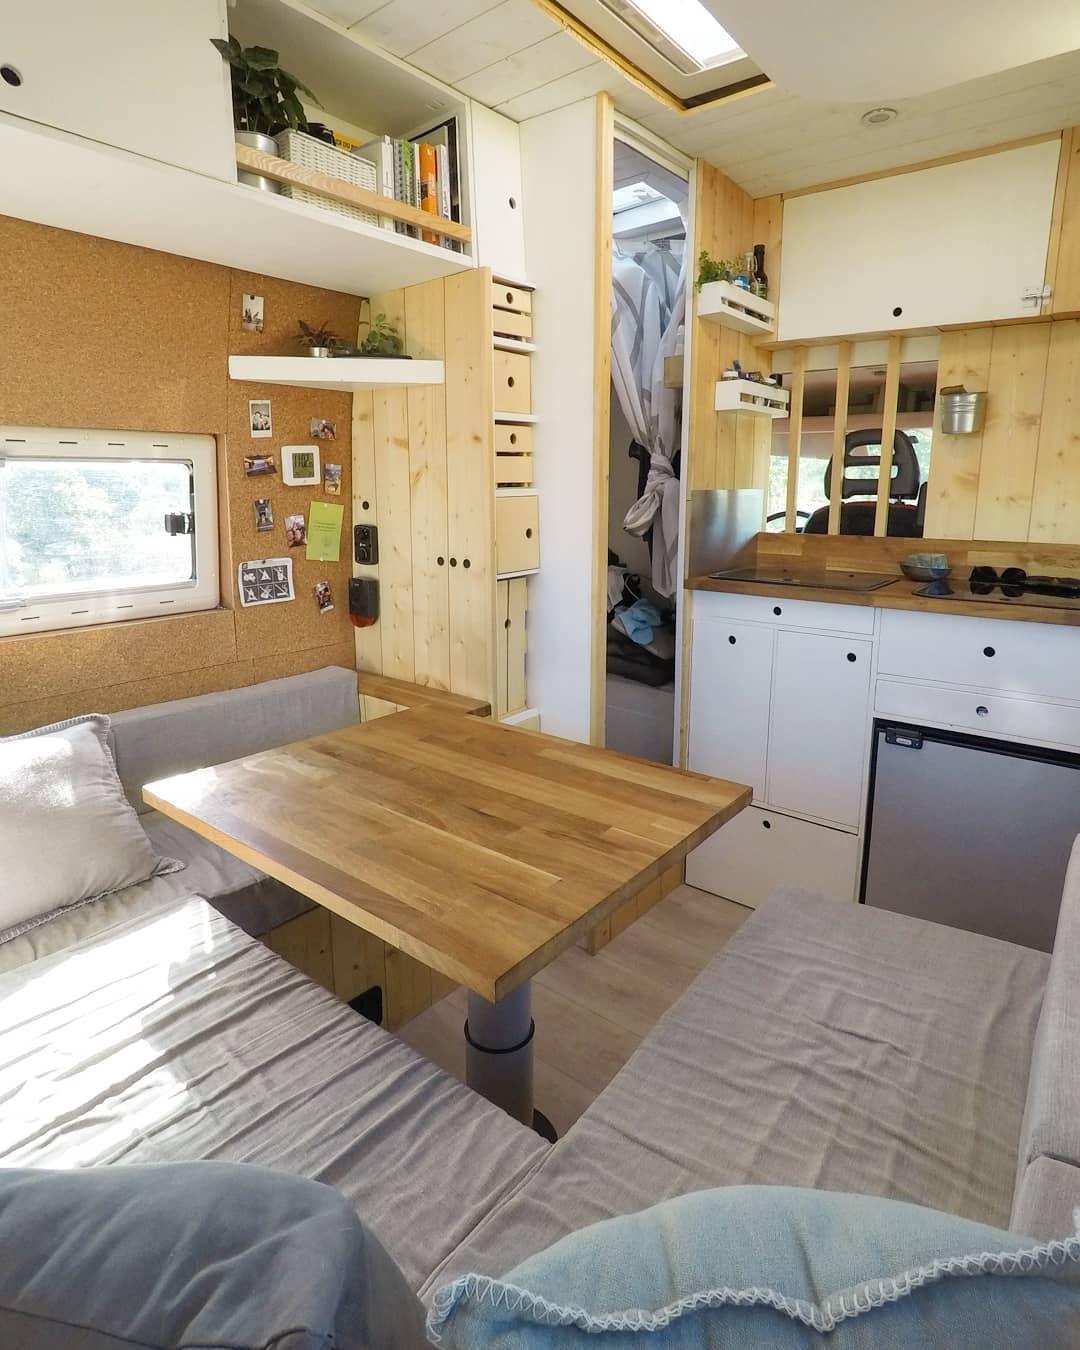 People also love these ideas creative campervan interior designs for your next van build rh pinterest